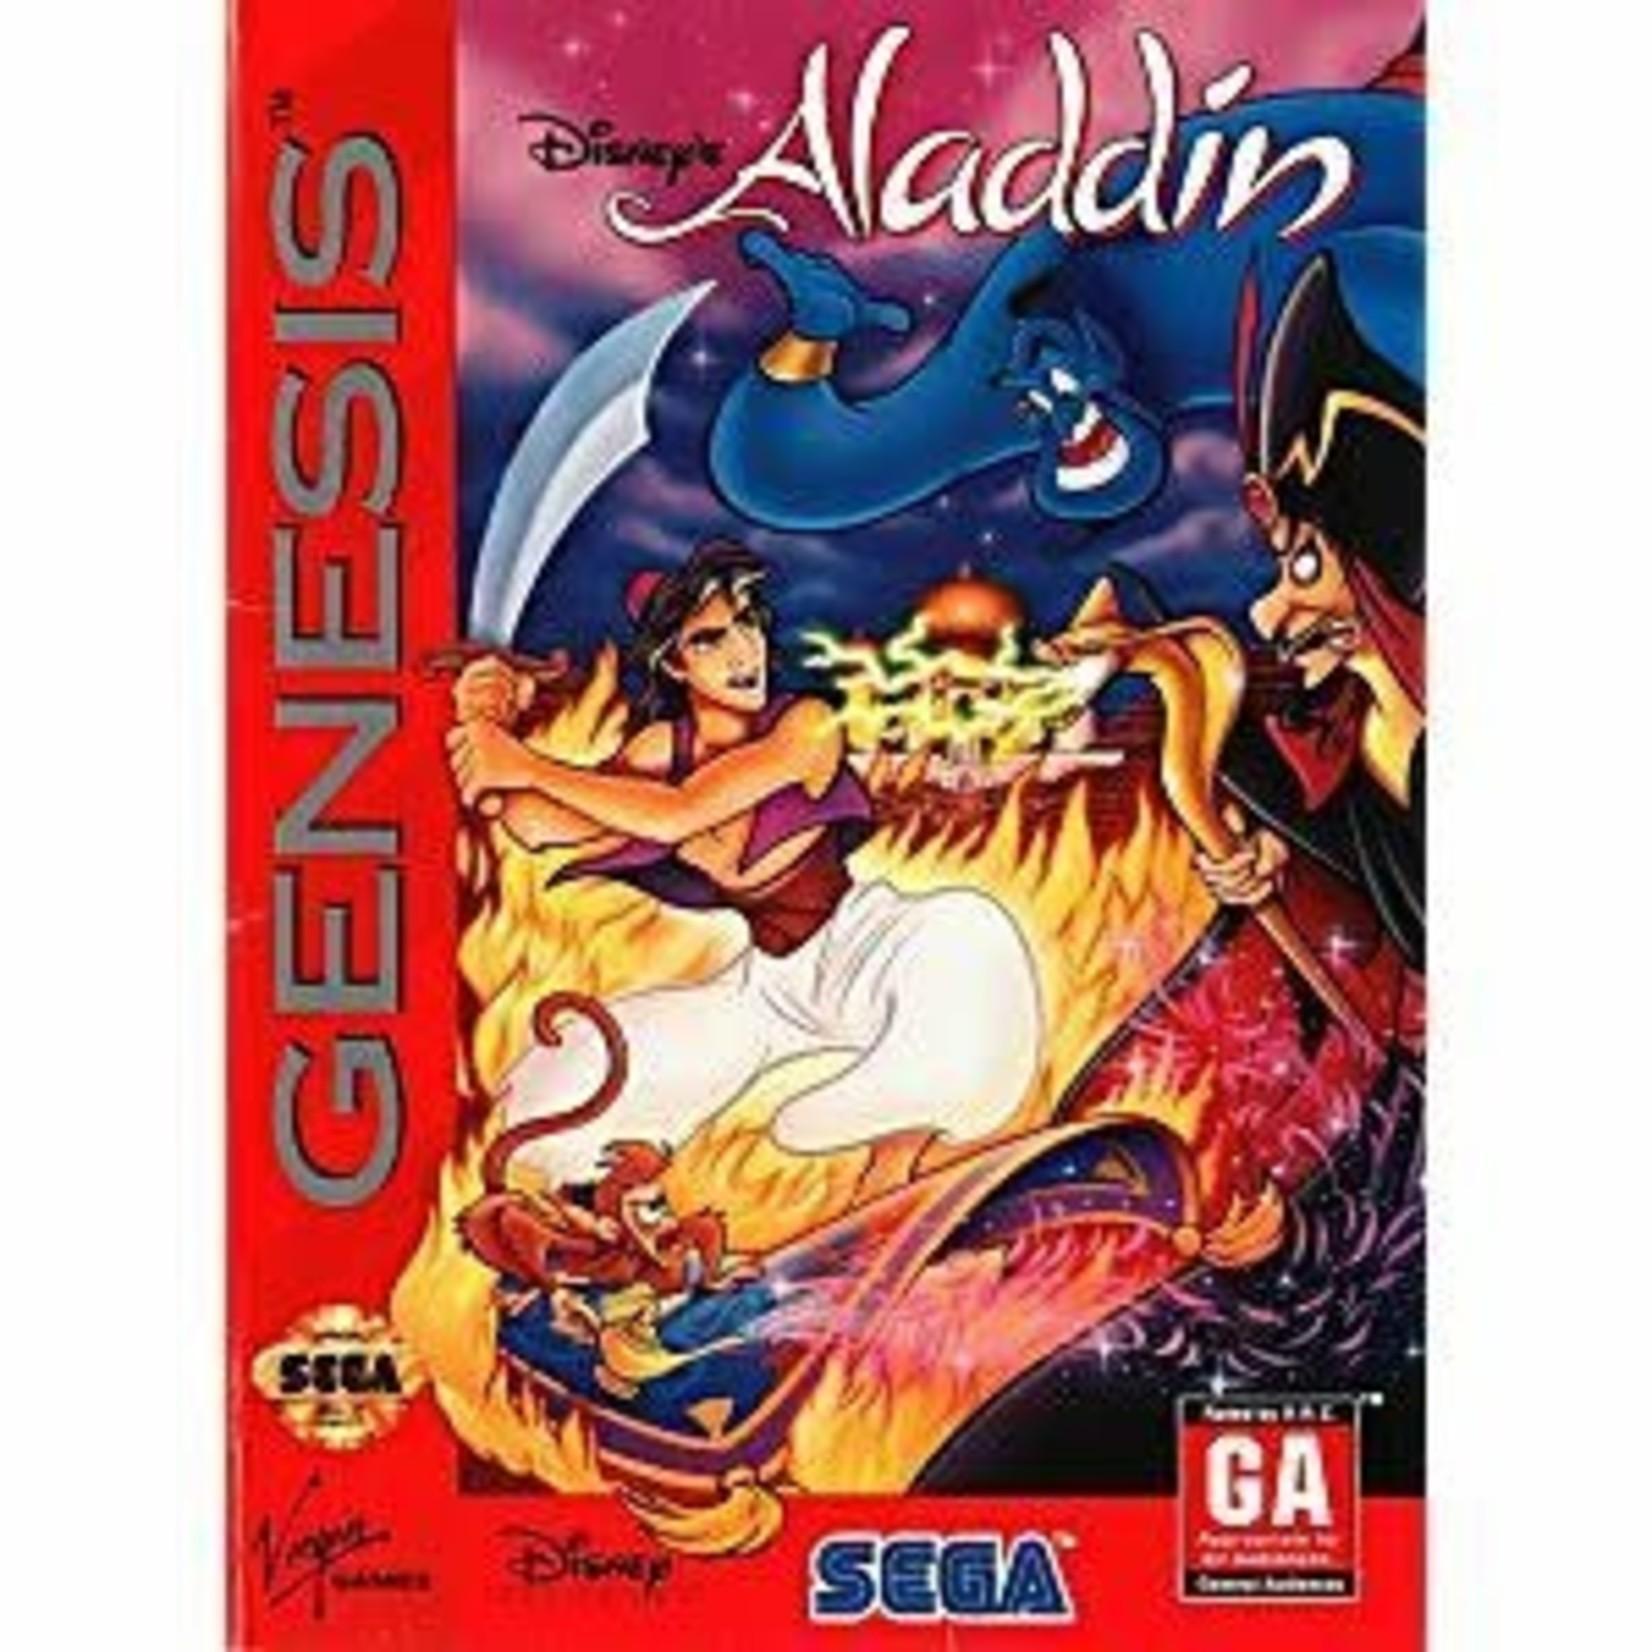 sgu-Aladdin (in box)